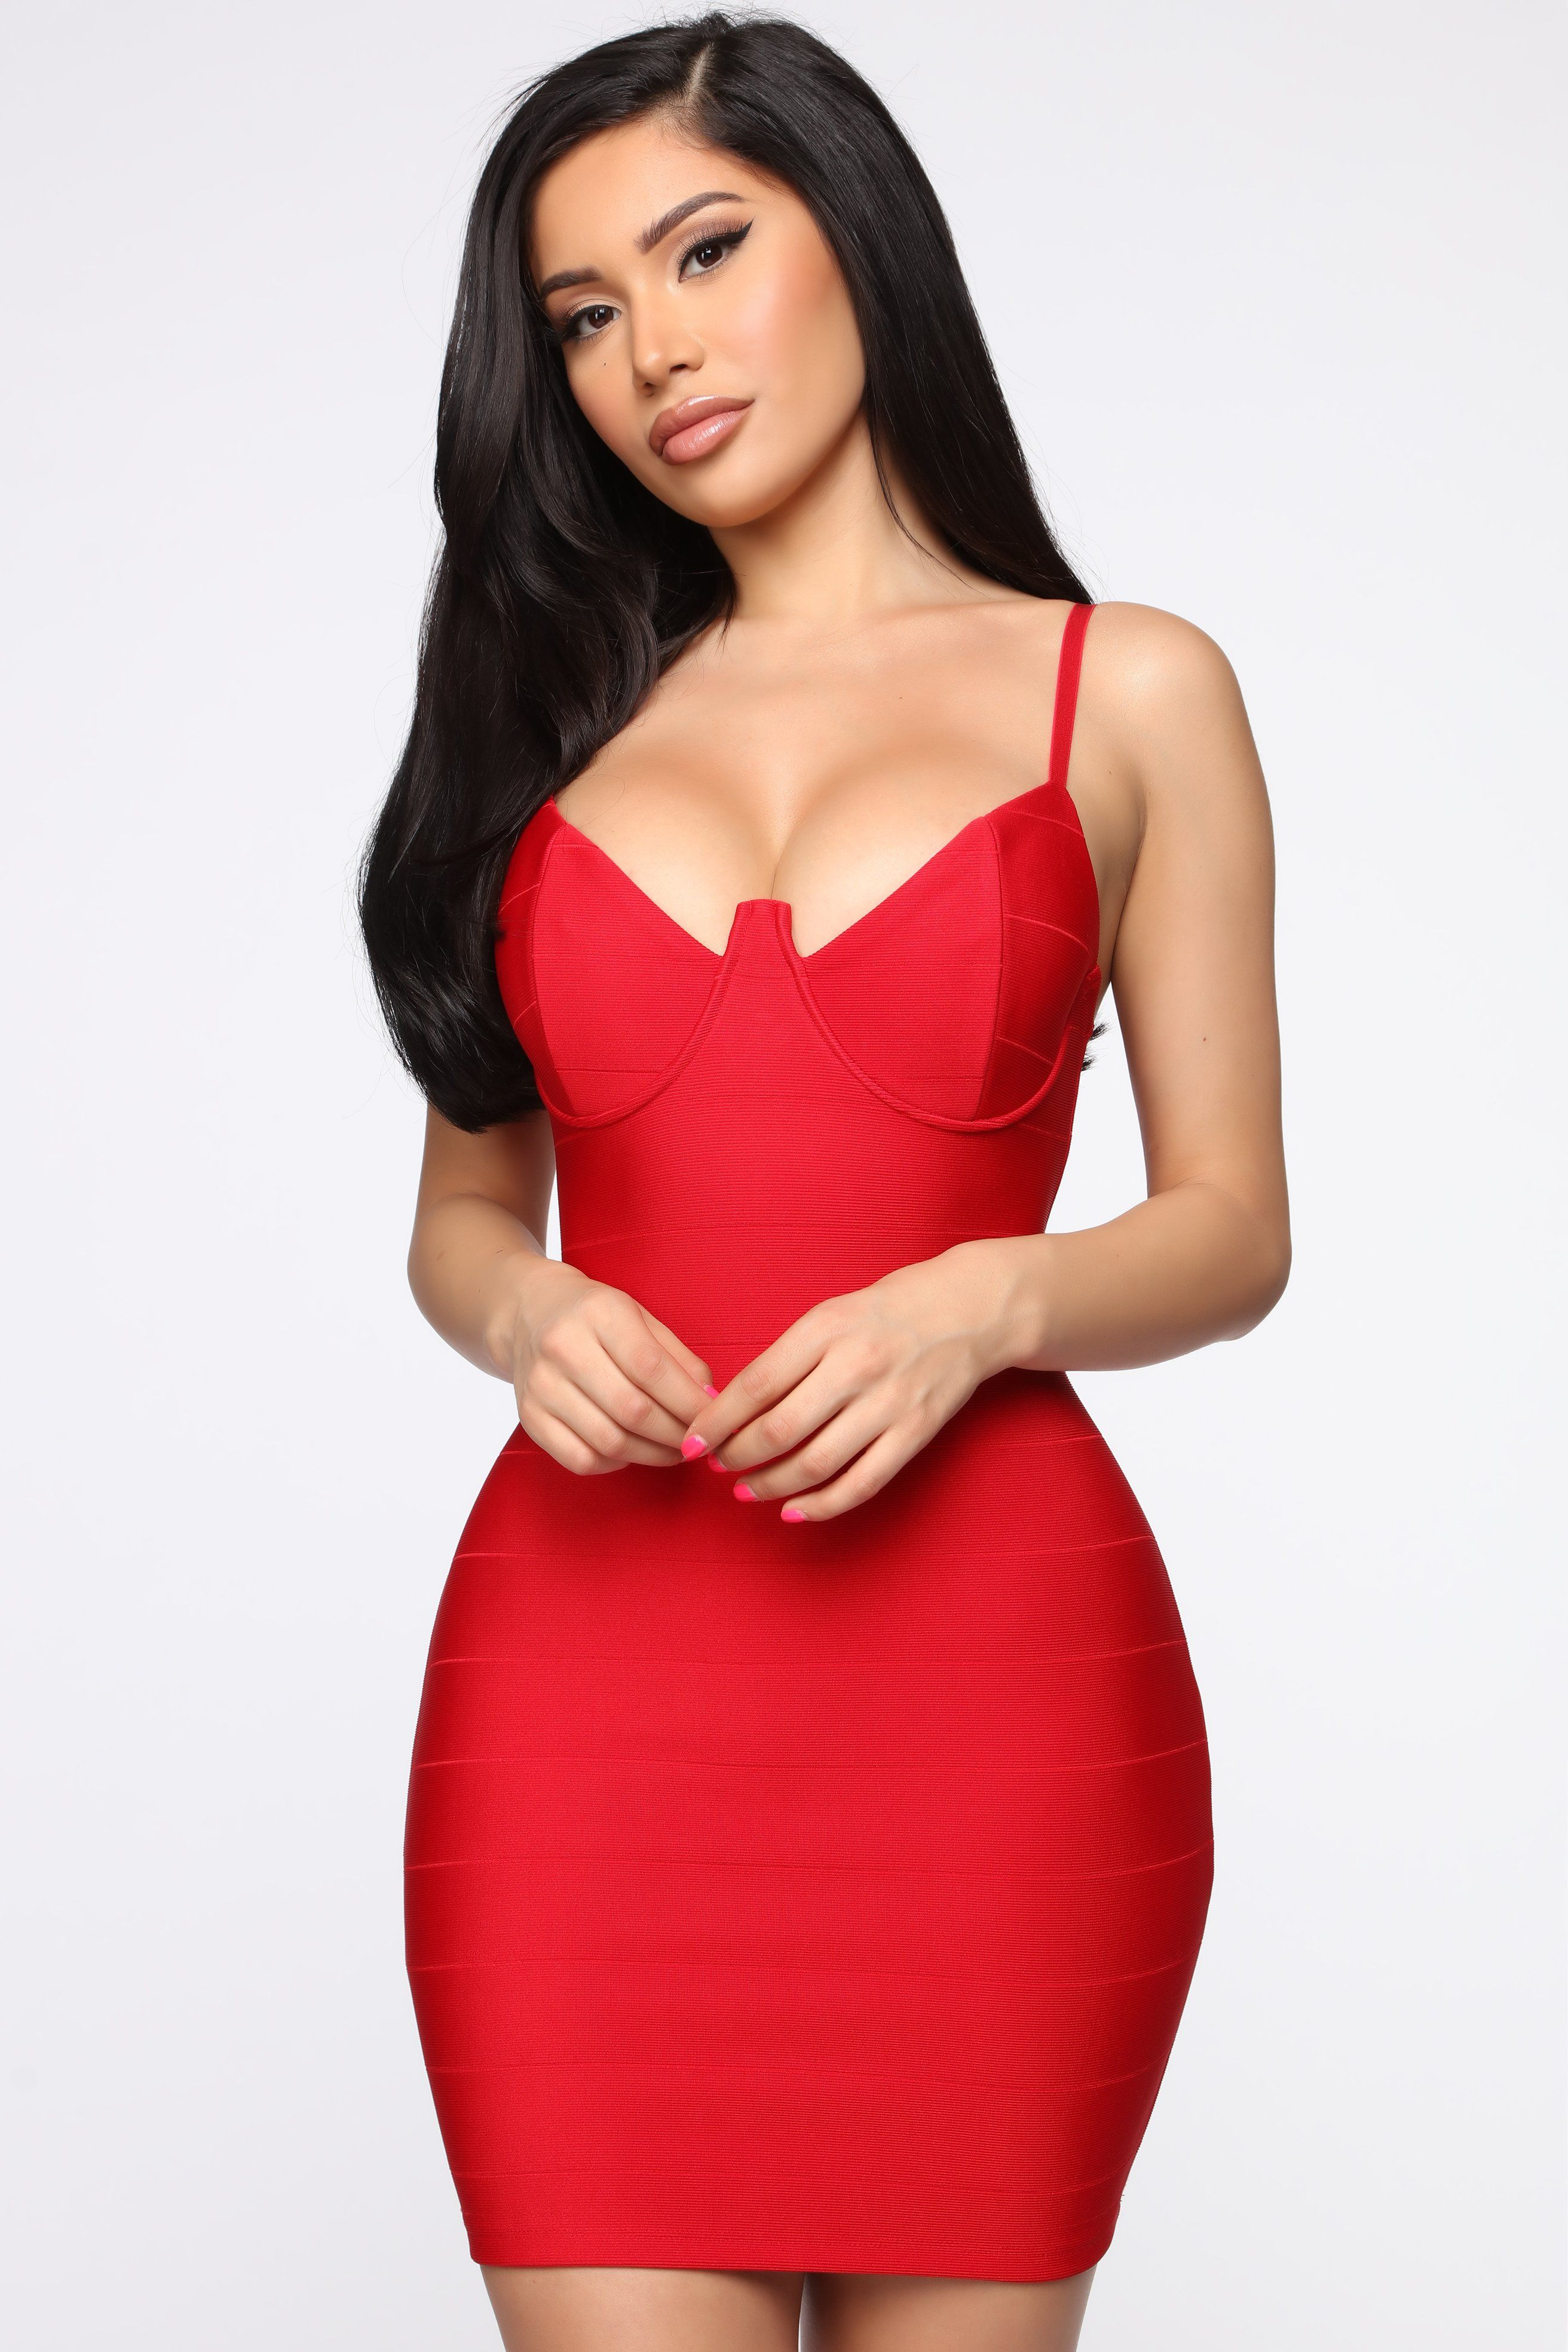 Playful Night Bandage Mini Dress Red in 2020 Mini